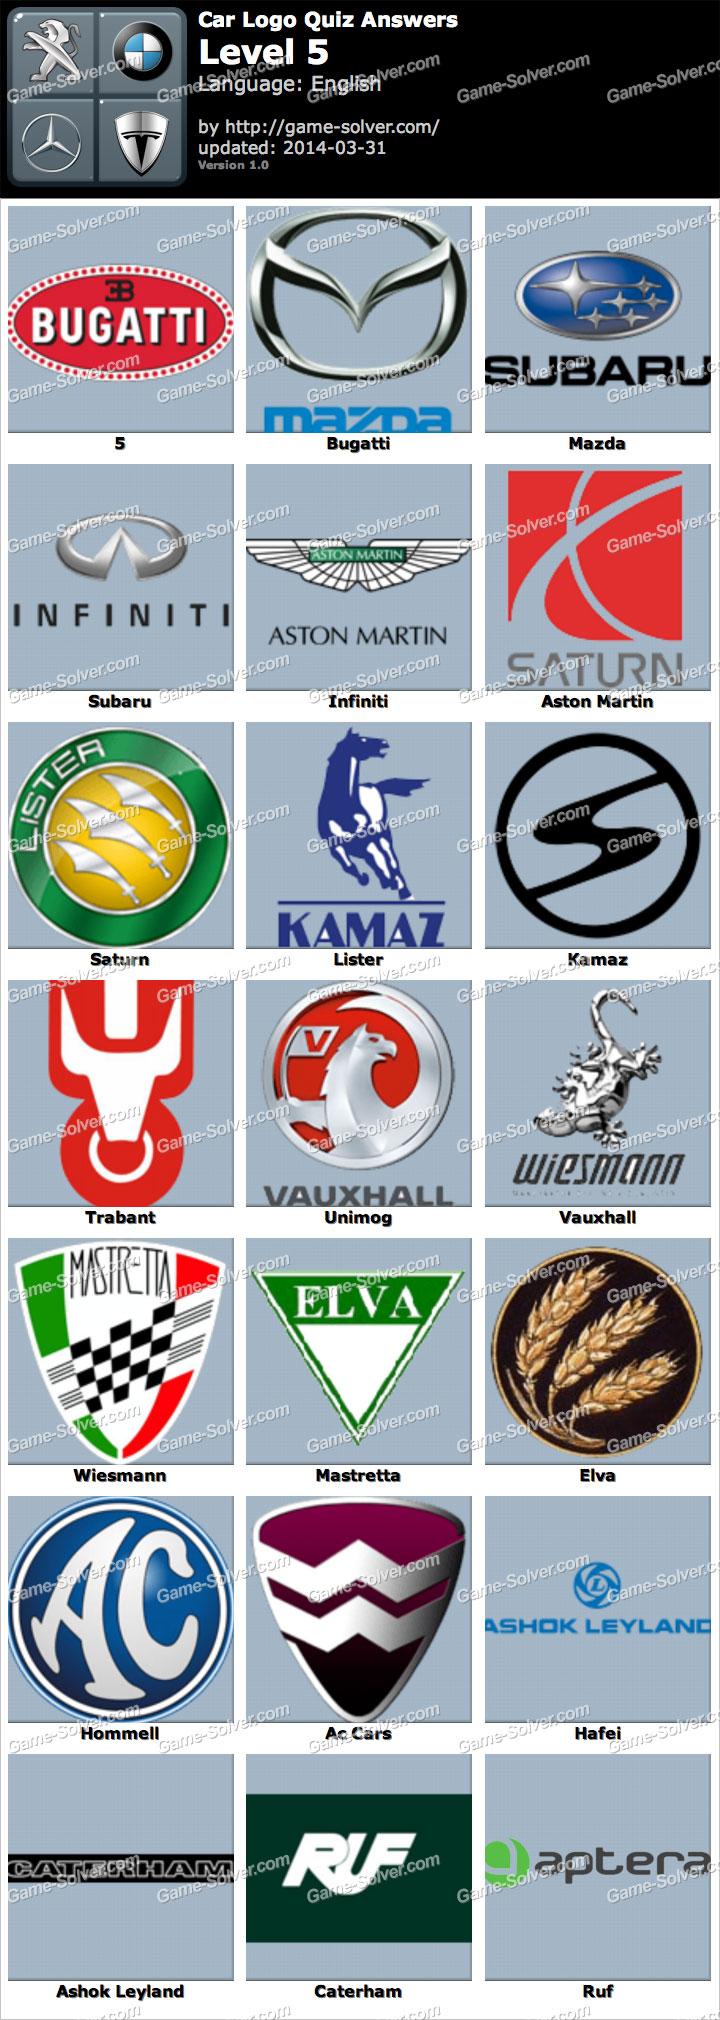 Logo Quiz Answers Level 8 Android App Car Logo Quiz Level 5 ...